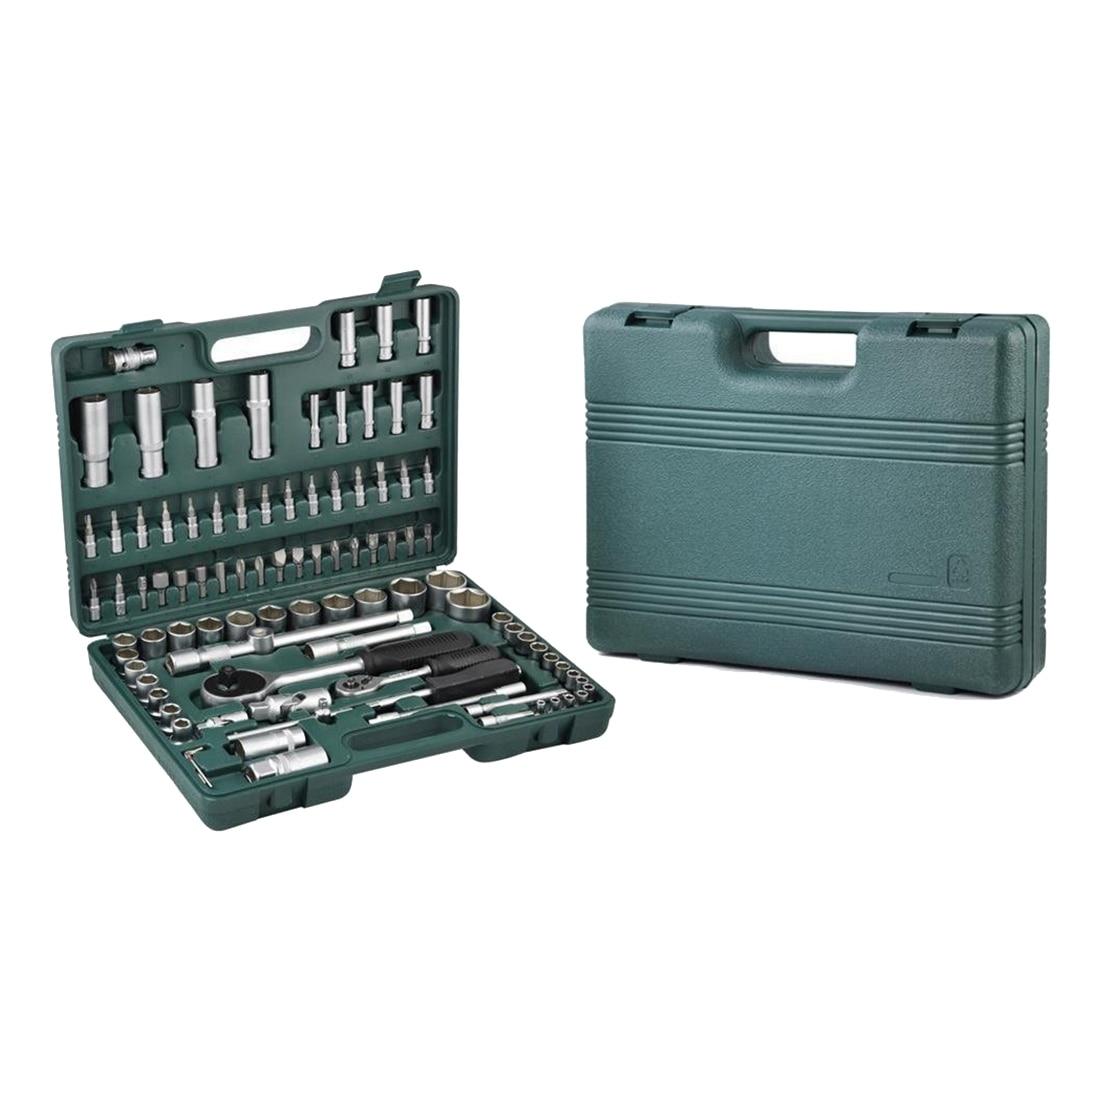 Promotion! 1/2 1/4 Socket and Bit Set Screwdriver Bit Tool Torx Ratchet Driver Kit+Glove (94 Pieces)<br>